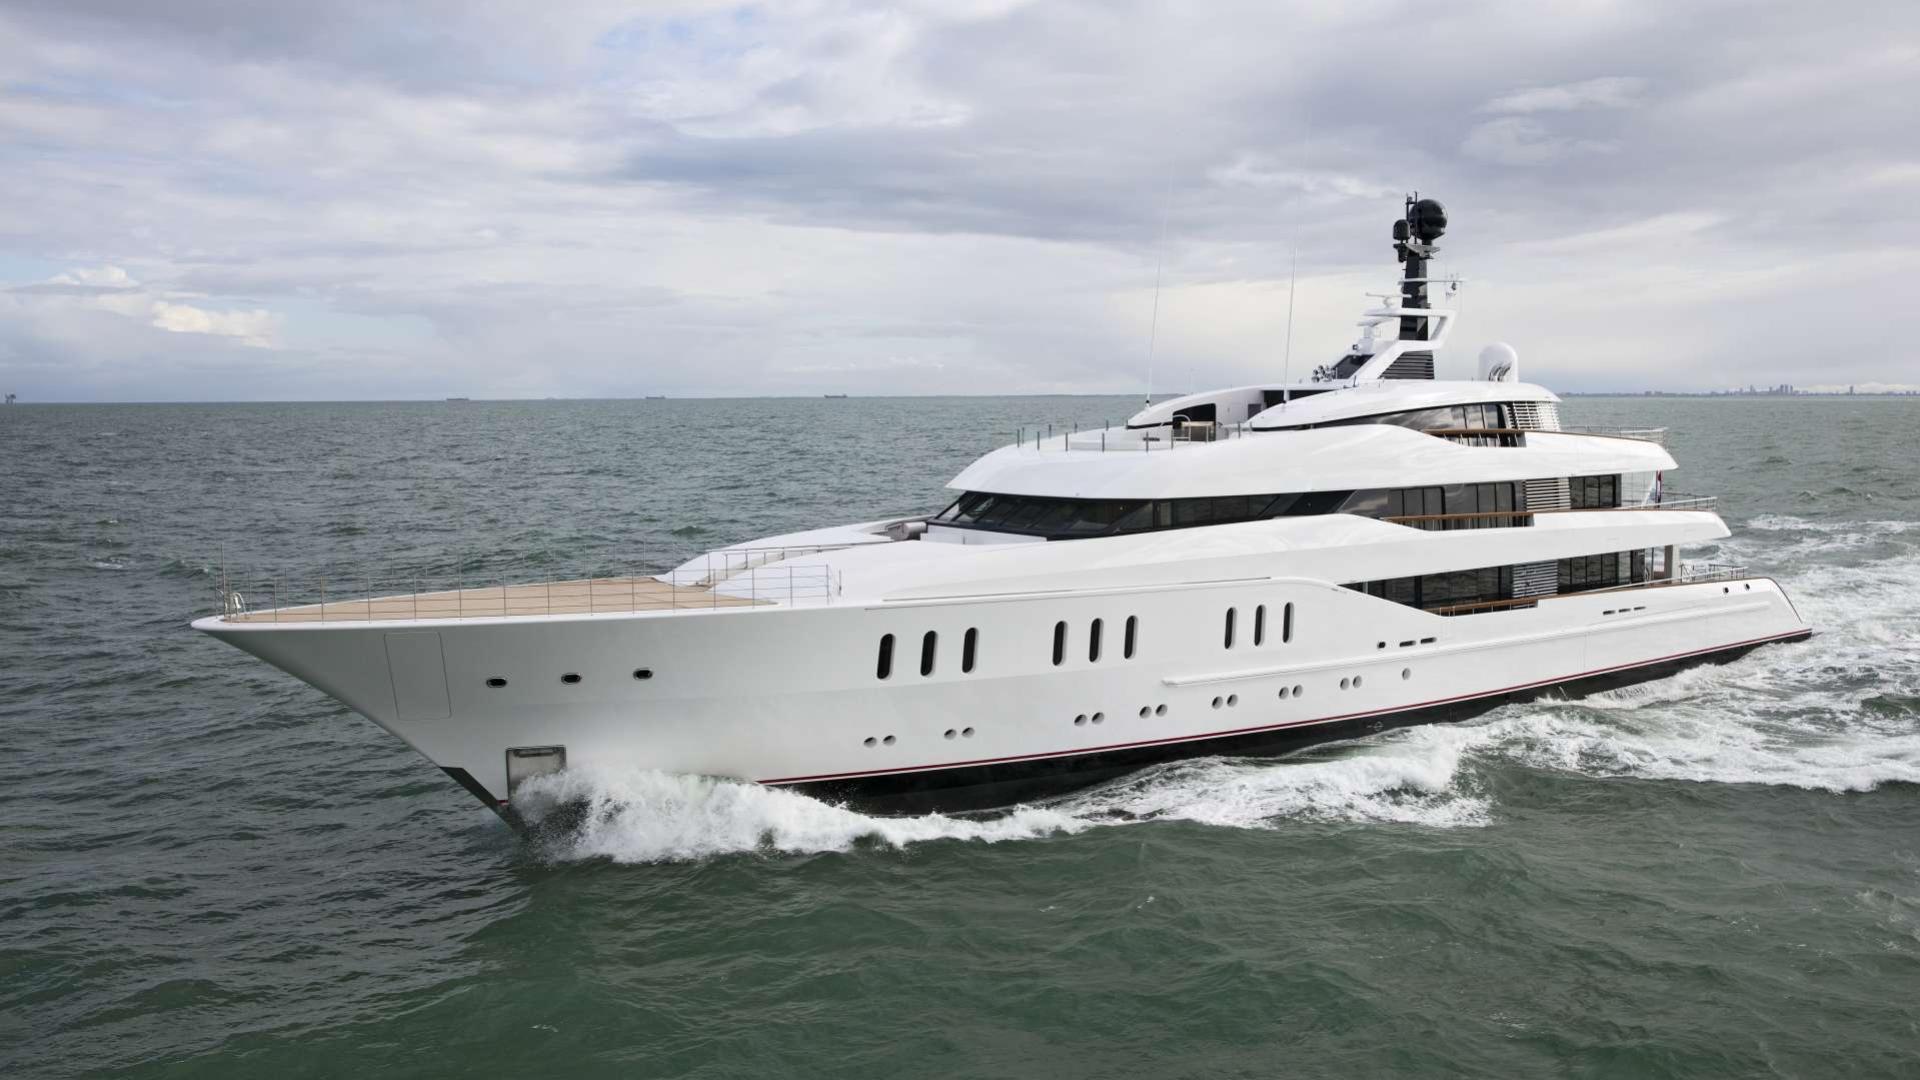 vanish-motor-yacht-feadship-2016-66m-profile